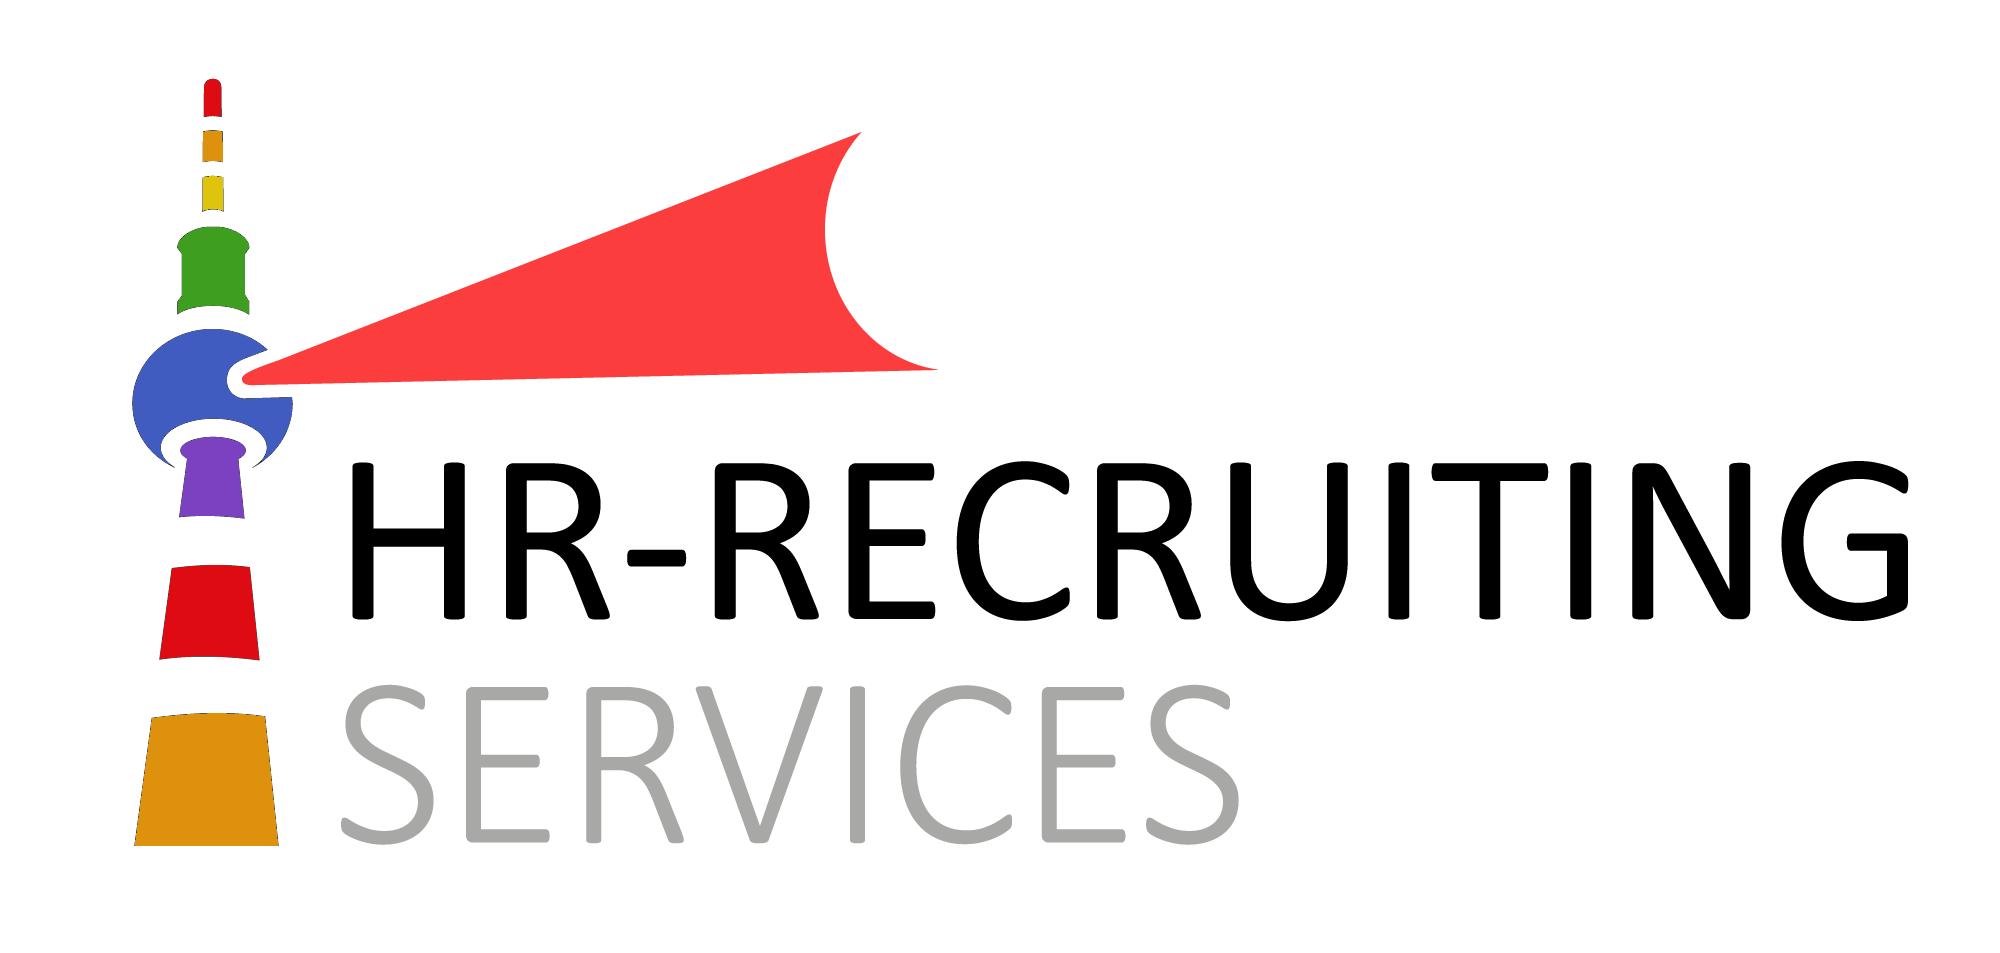 We shape future recruitment - and we love love!